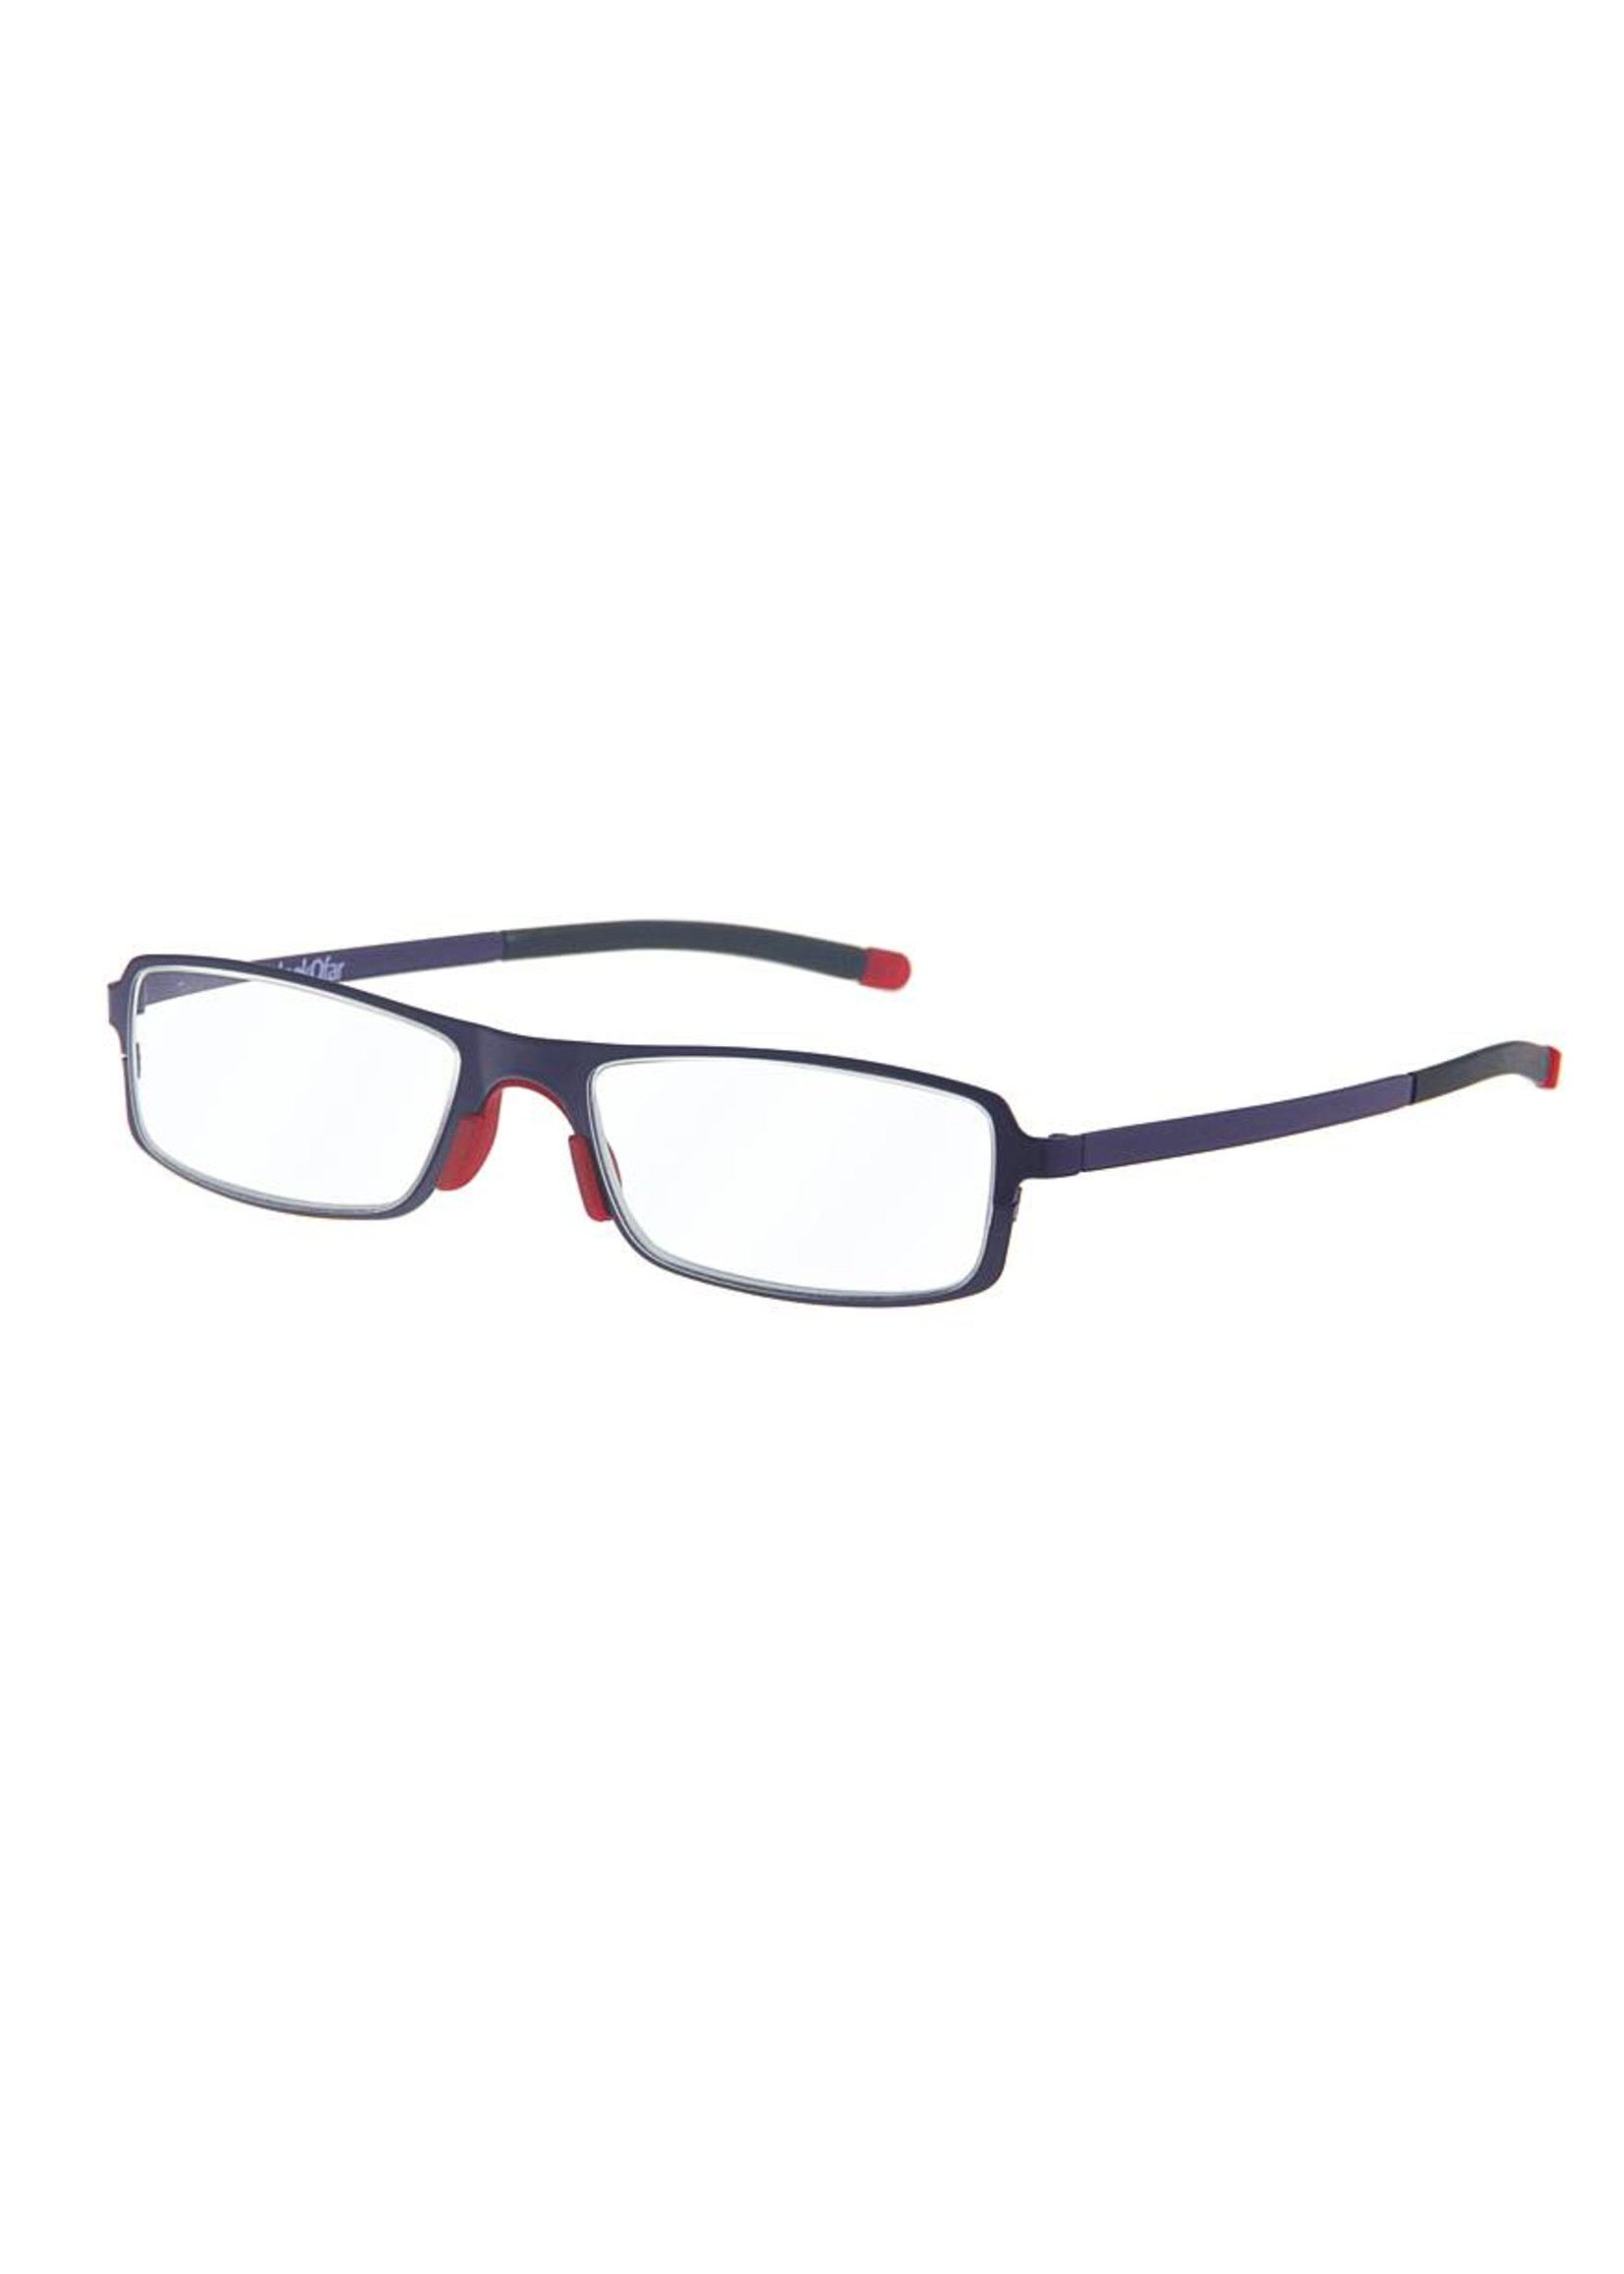 Trendy en kleurrijke leesbril van lookofar model LE0-173